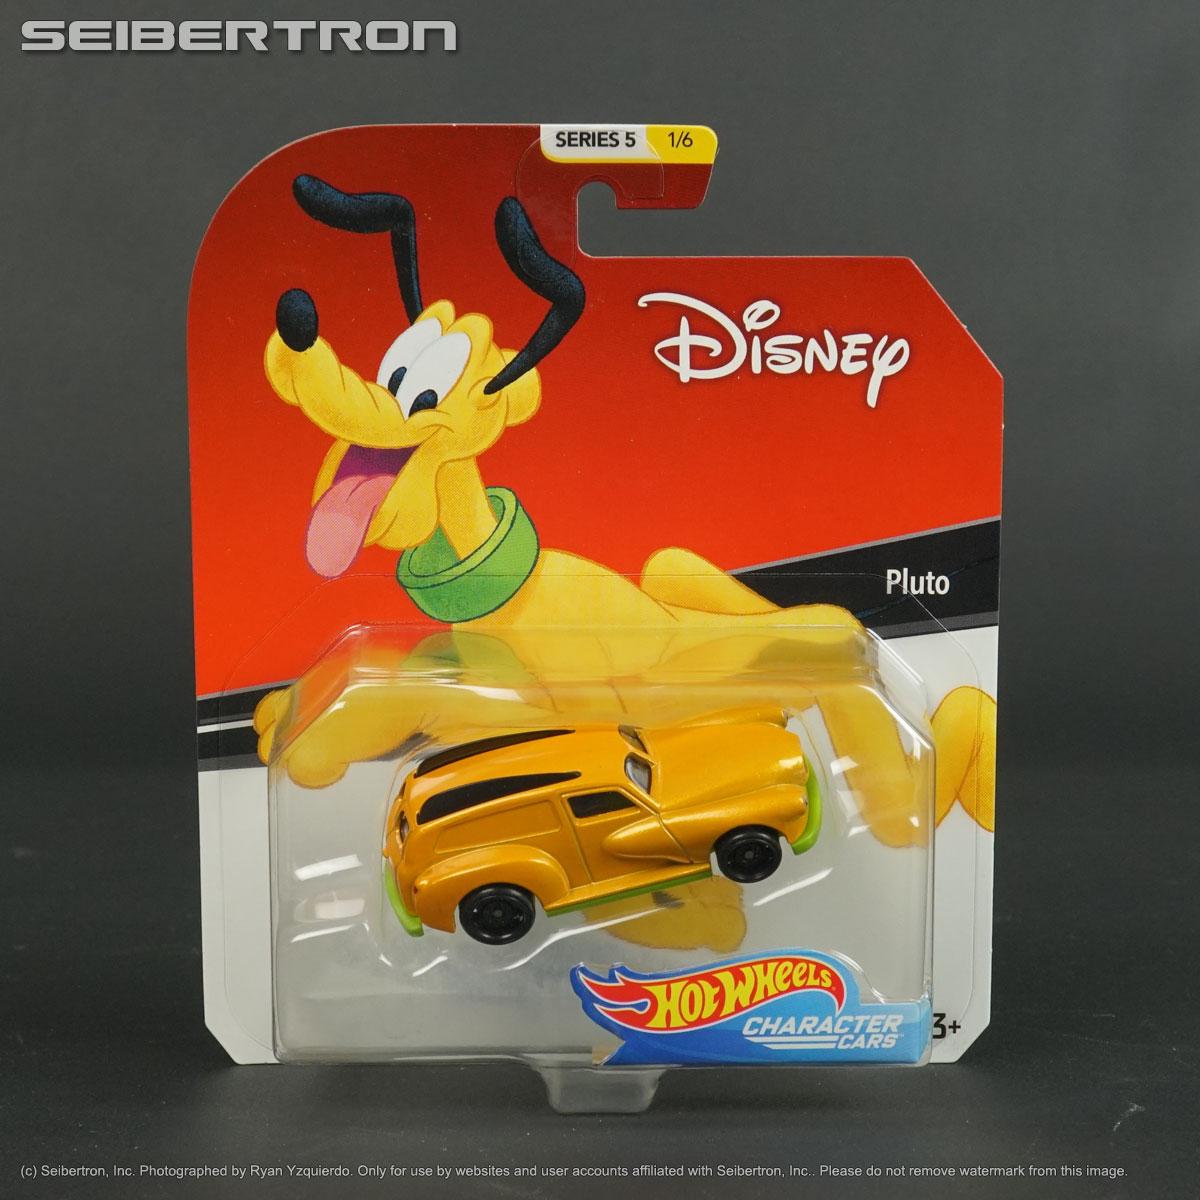 Pluto Disney Hot Wheels Diecast Car 1:64 Scale